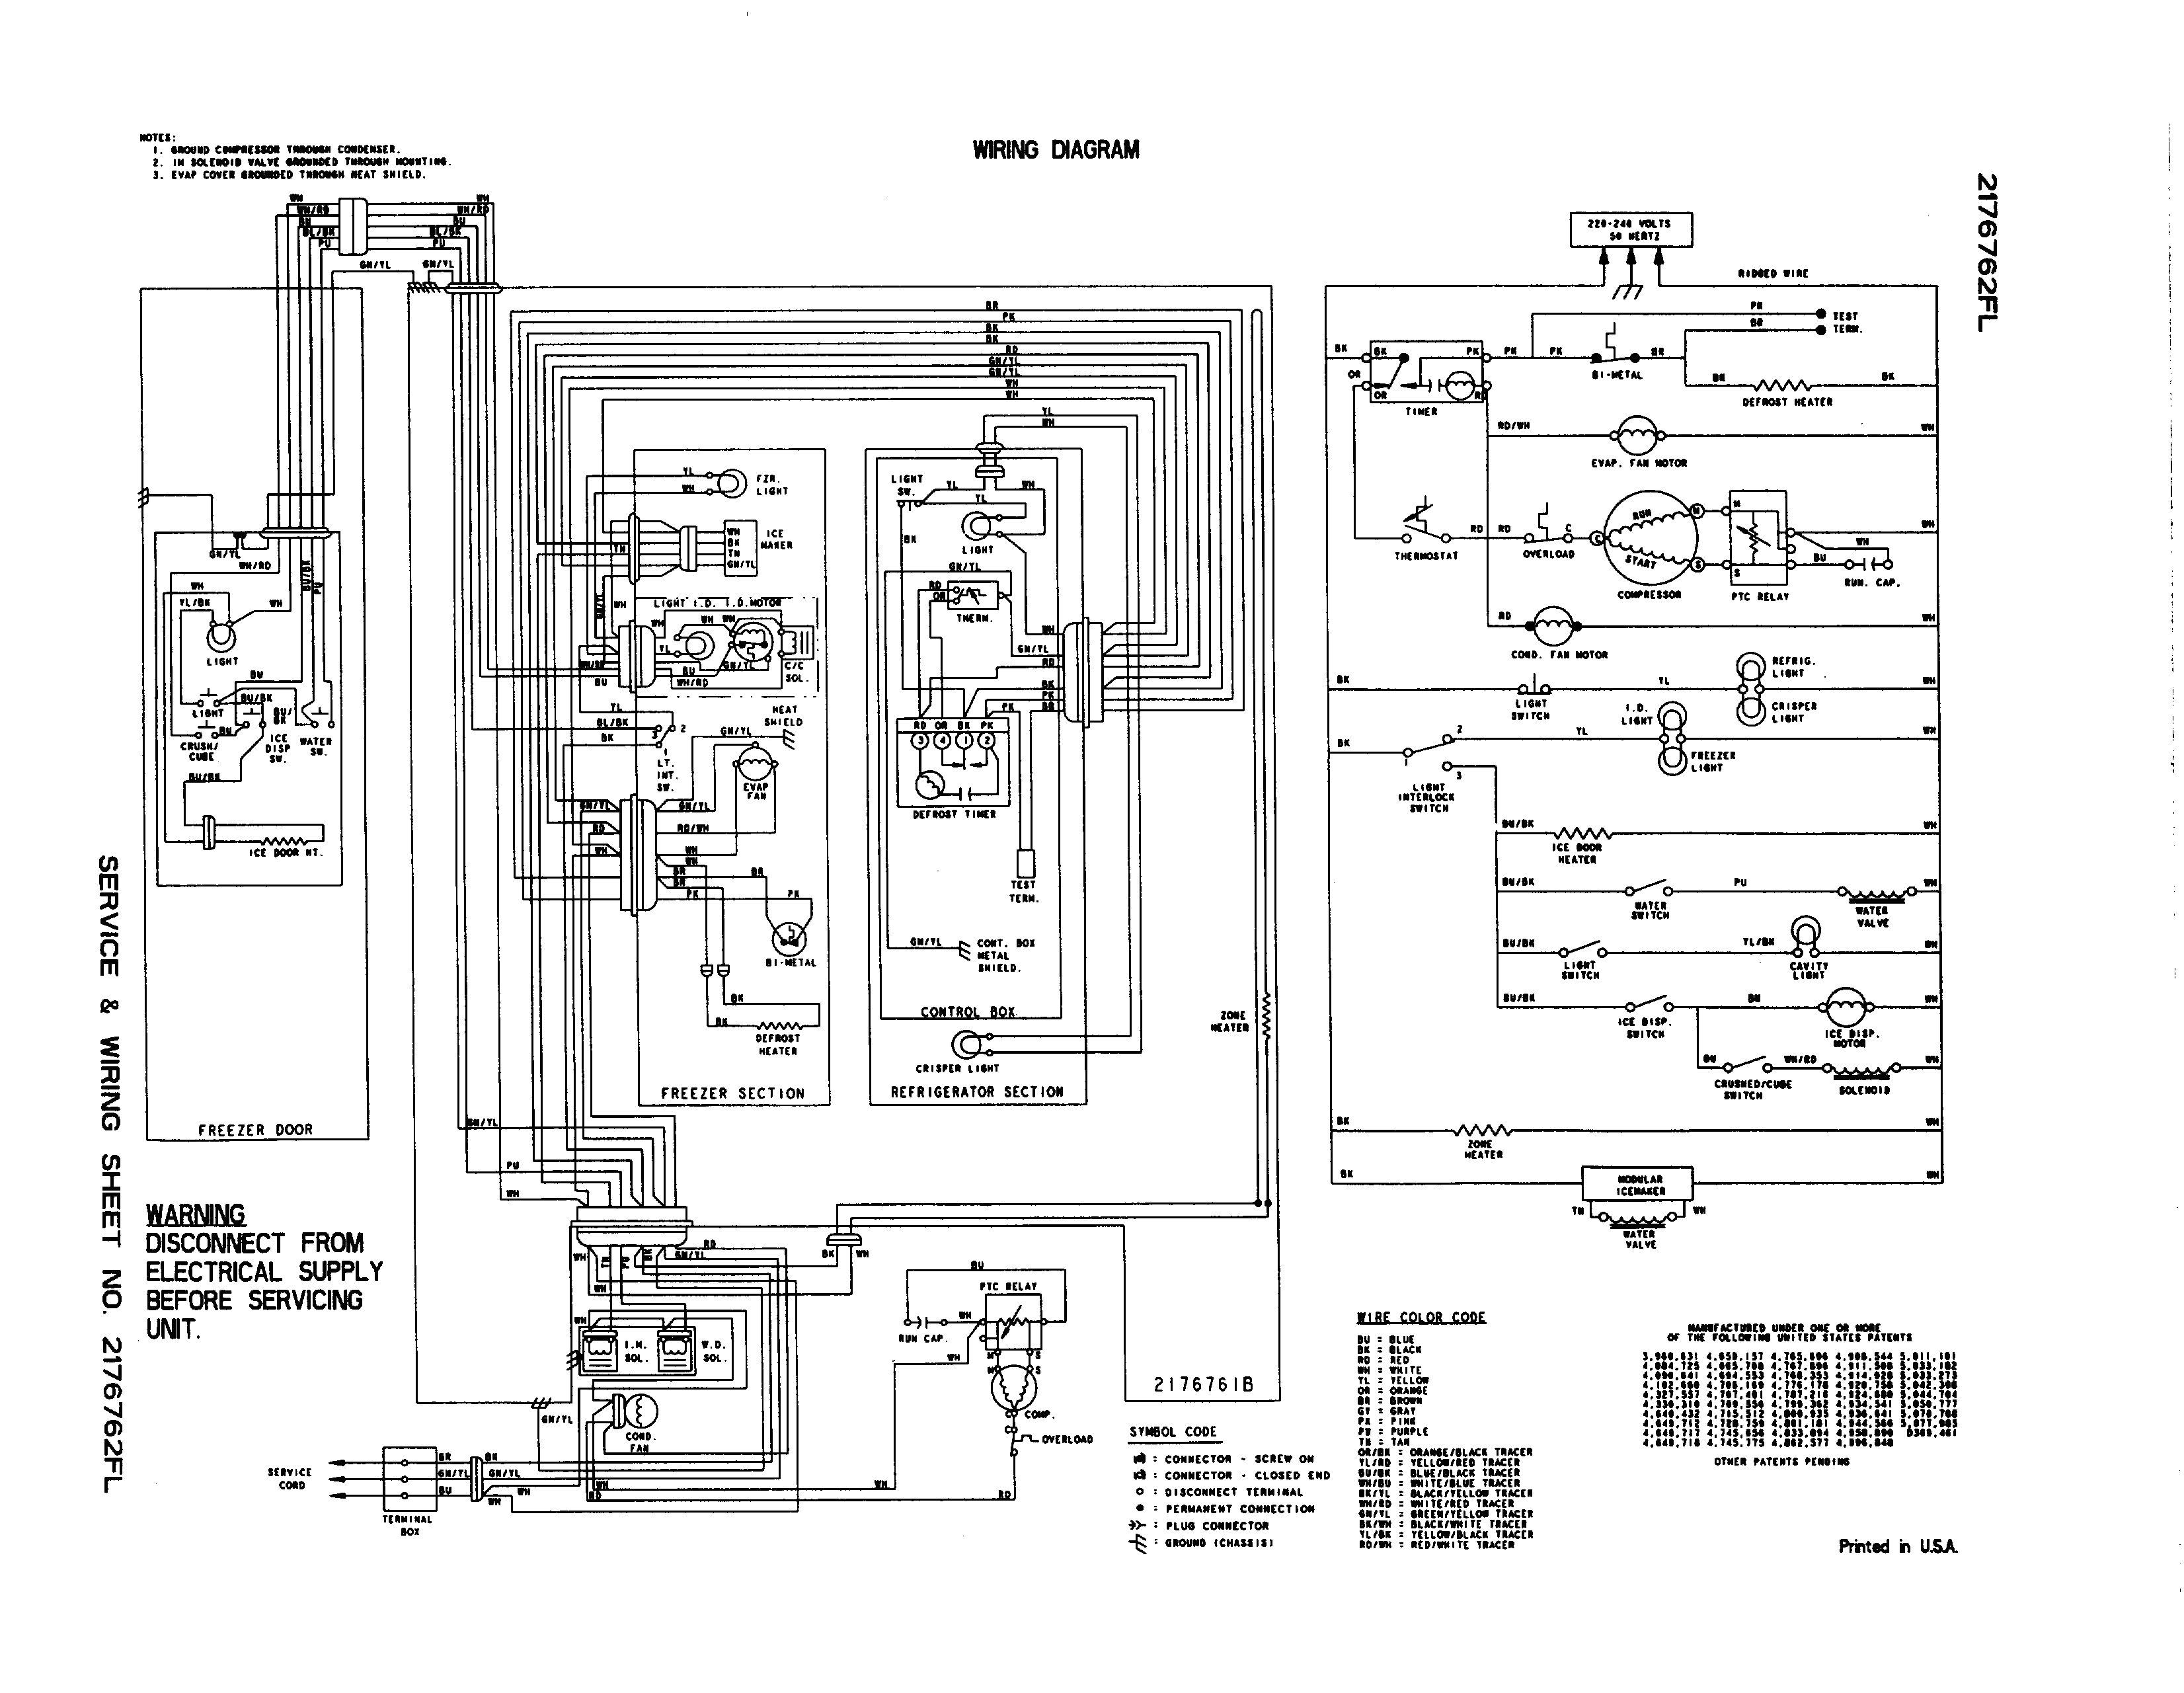 wiring diagram whirlpool ice maker data wiring diagram preview fridge diagram maker fridge diagram maker